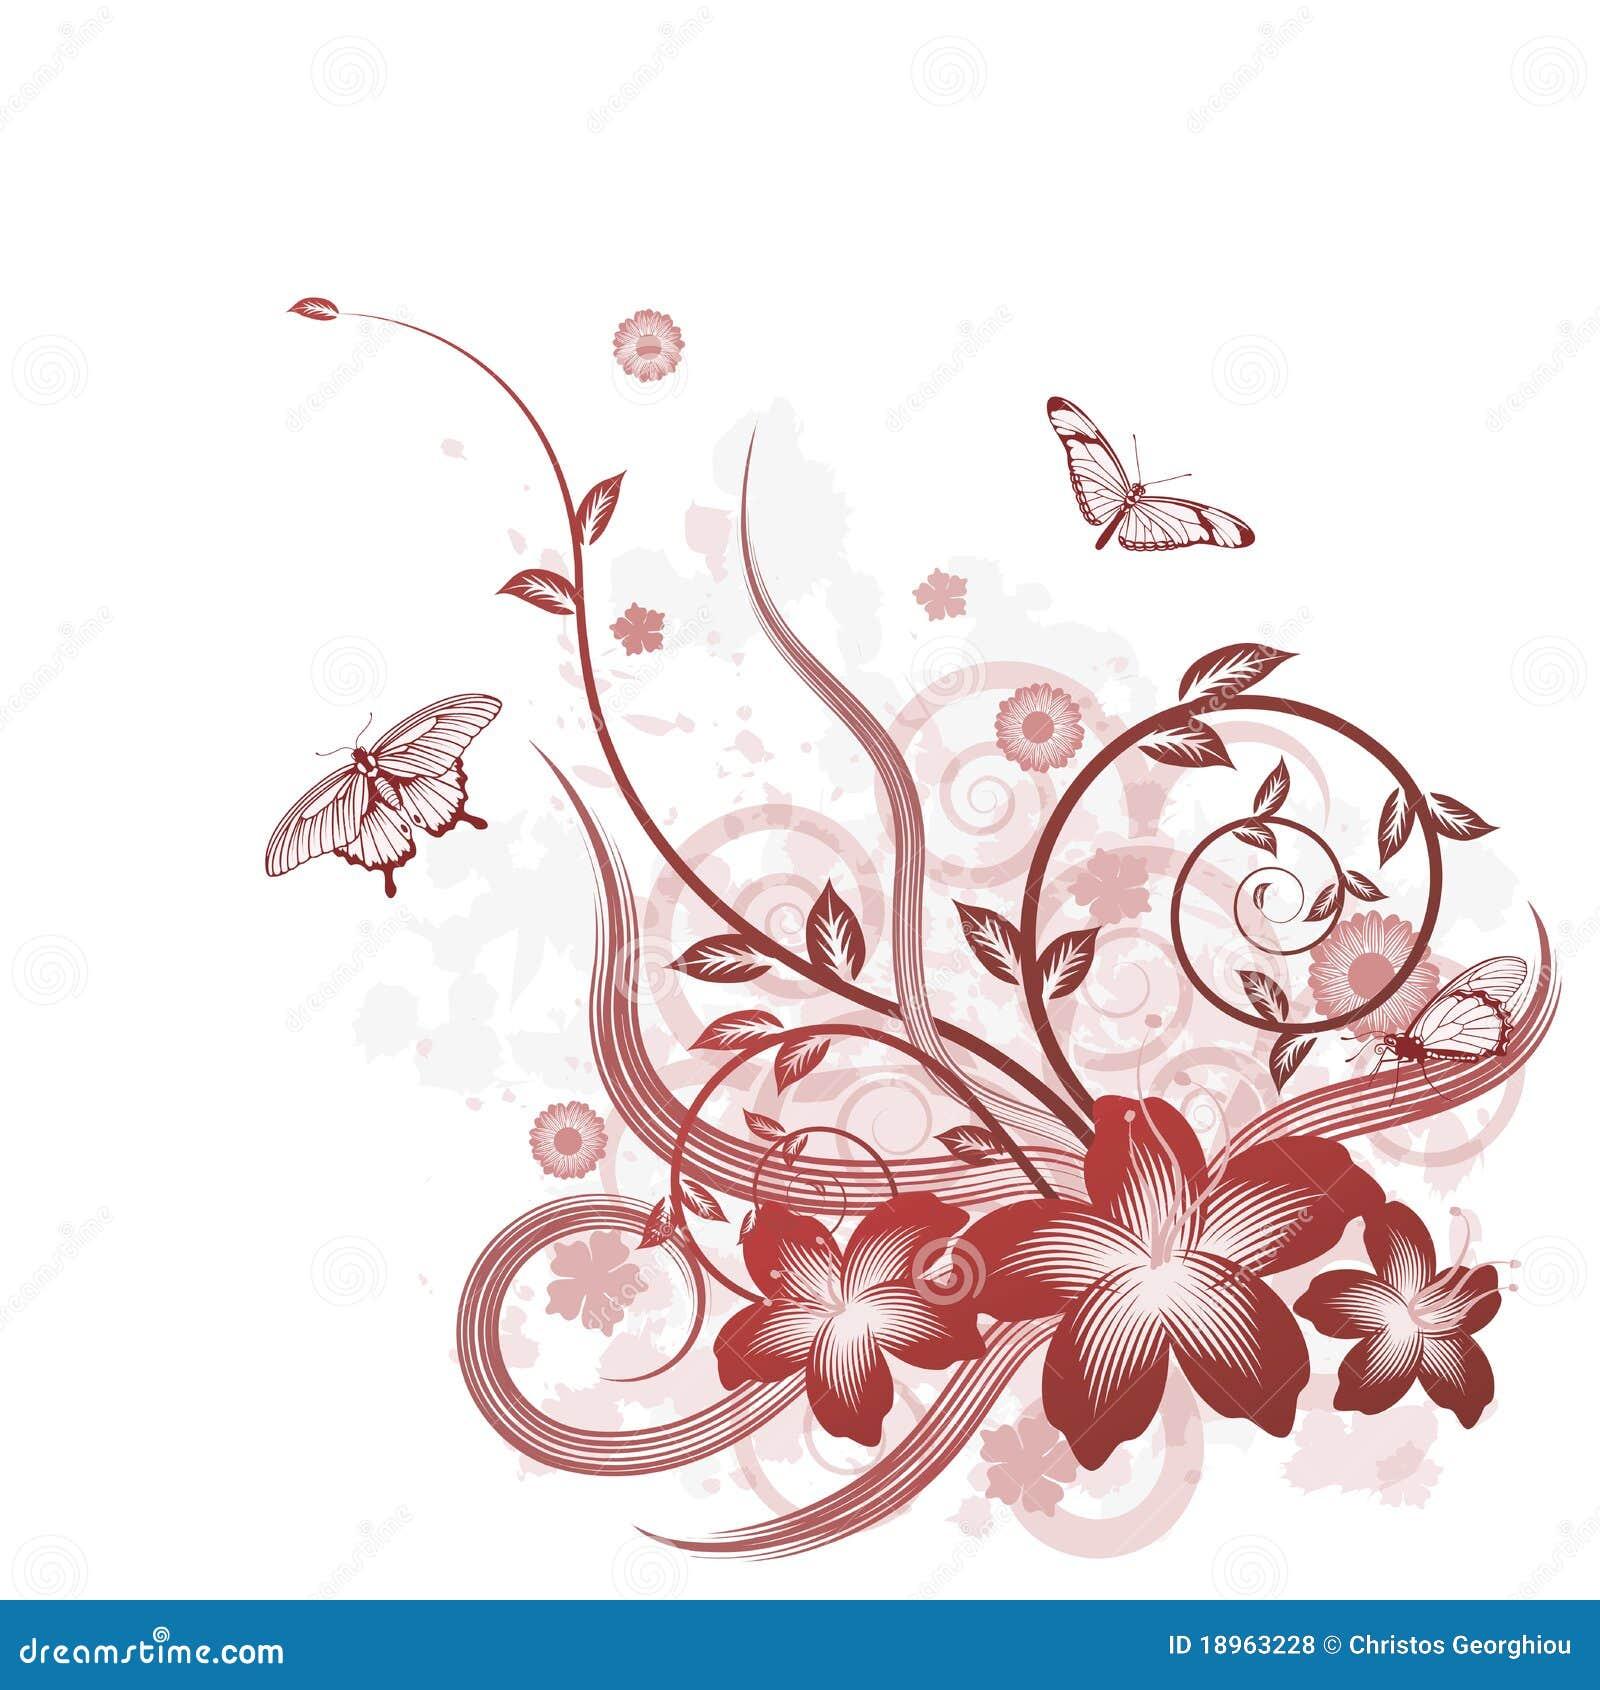 beautiful flower background motif stock vector. Black Bedroom Furniture Sets. Home Design Ideas